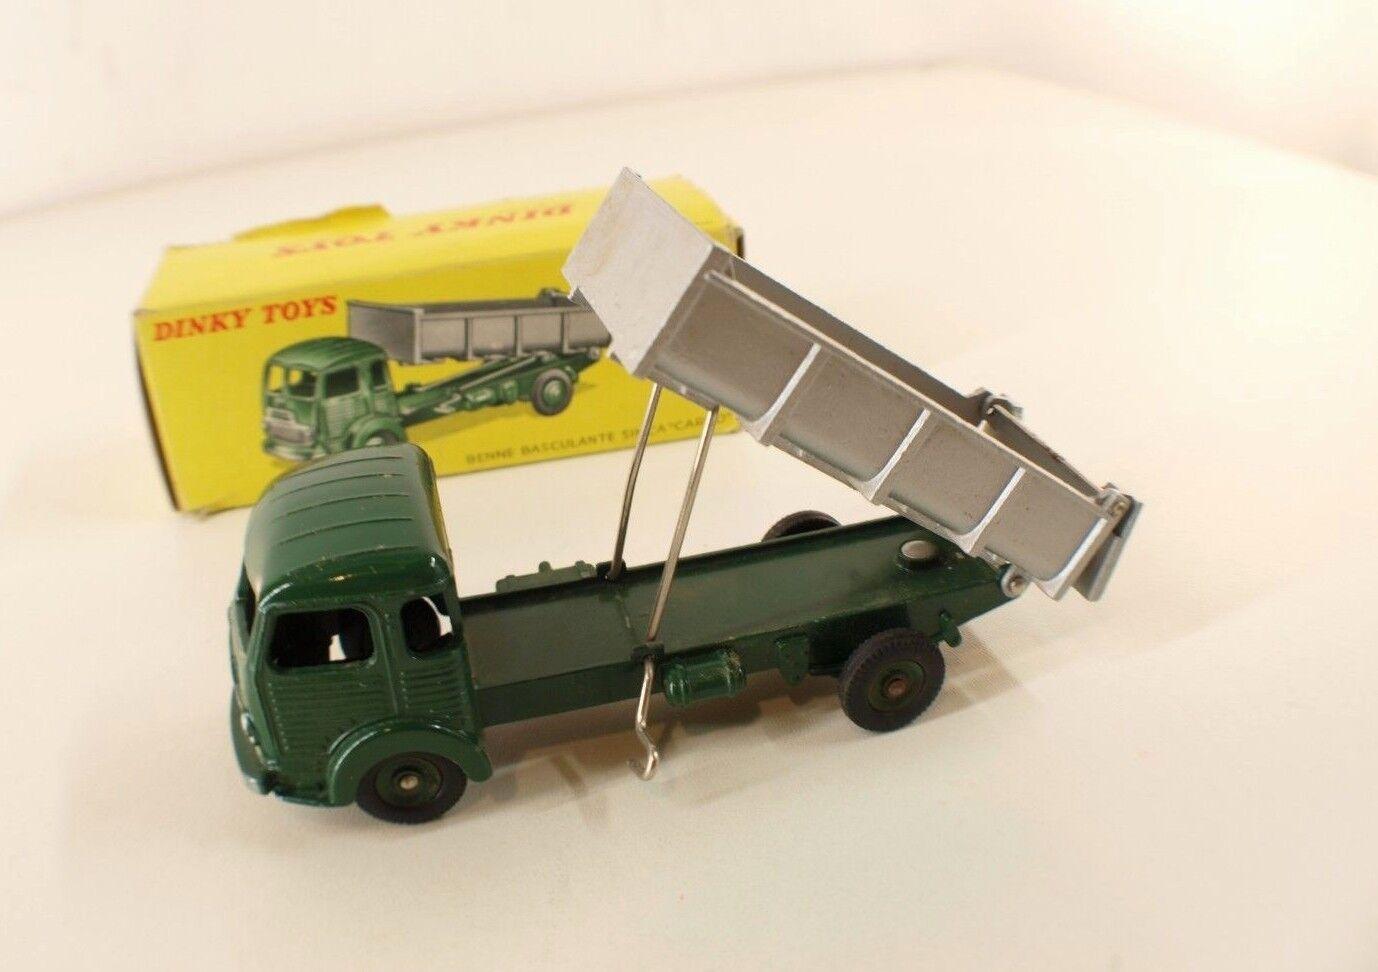 Dinky toys F n° 33 B camion Simca cargo benne basculante jamais joué en boite